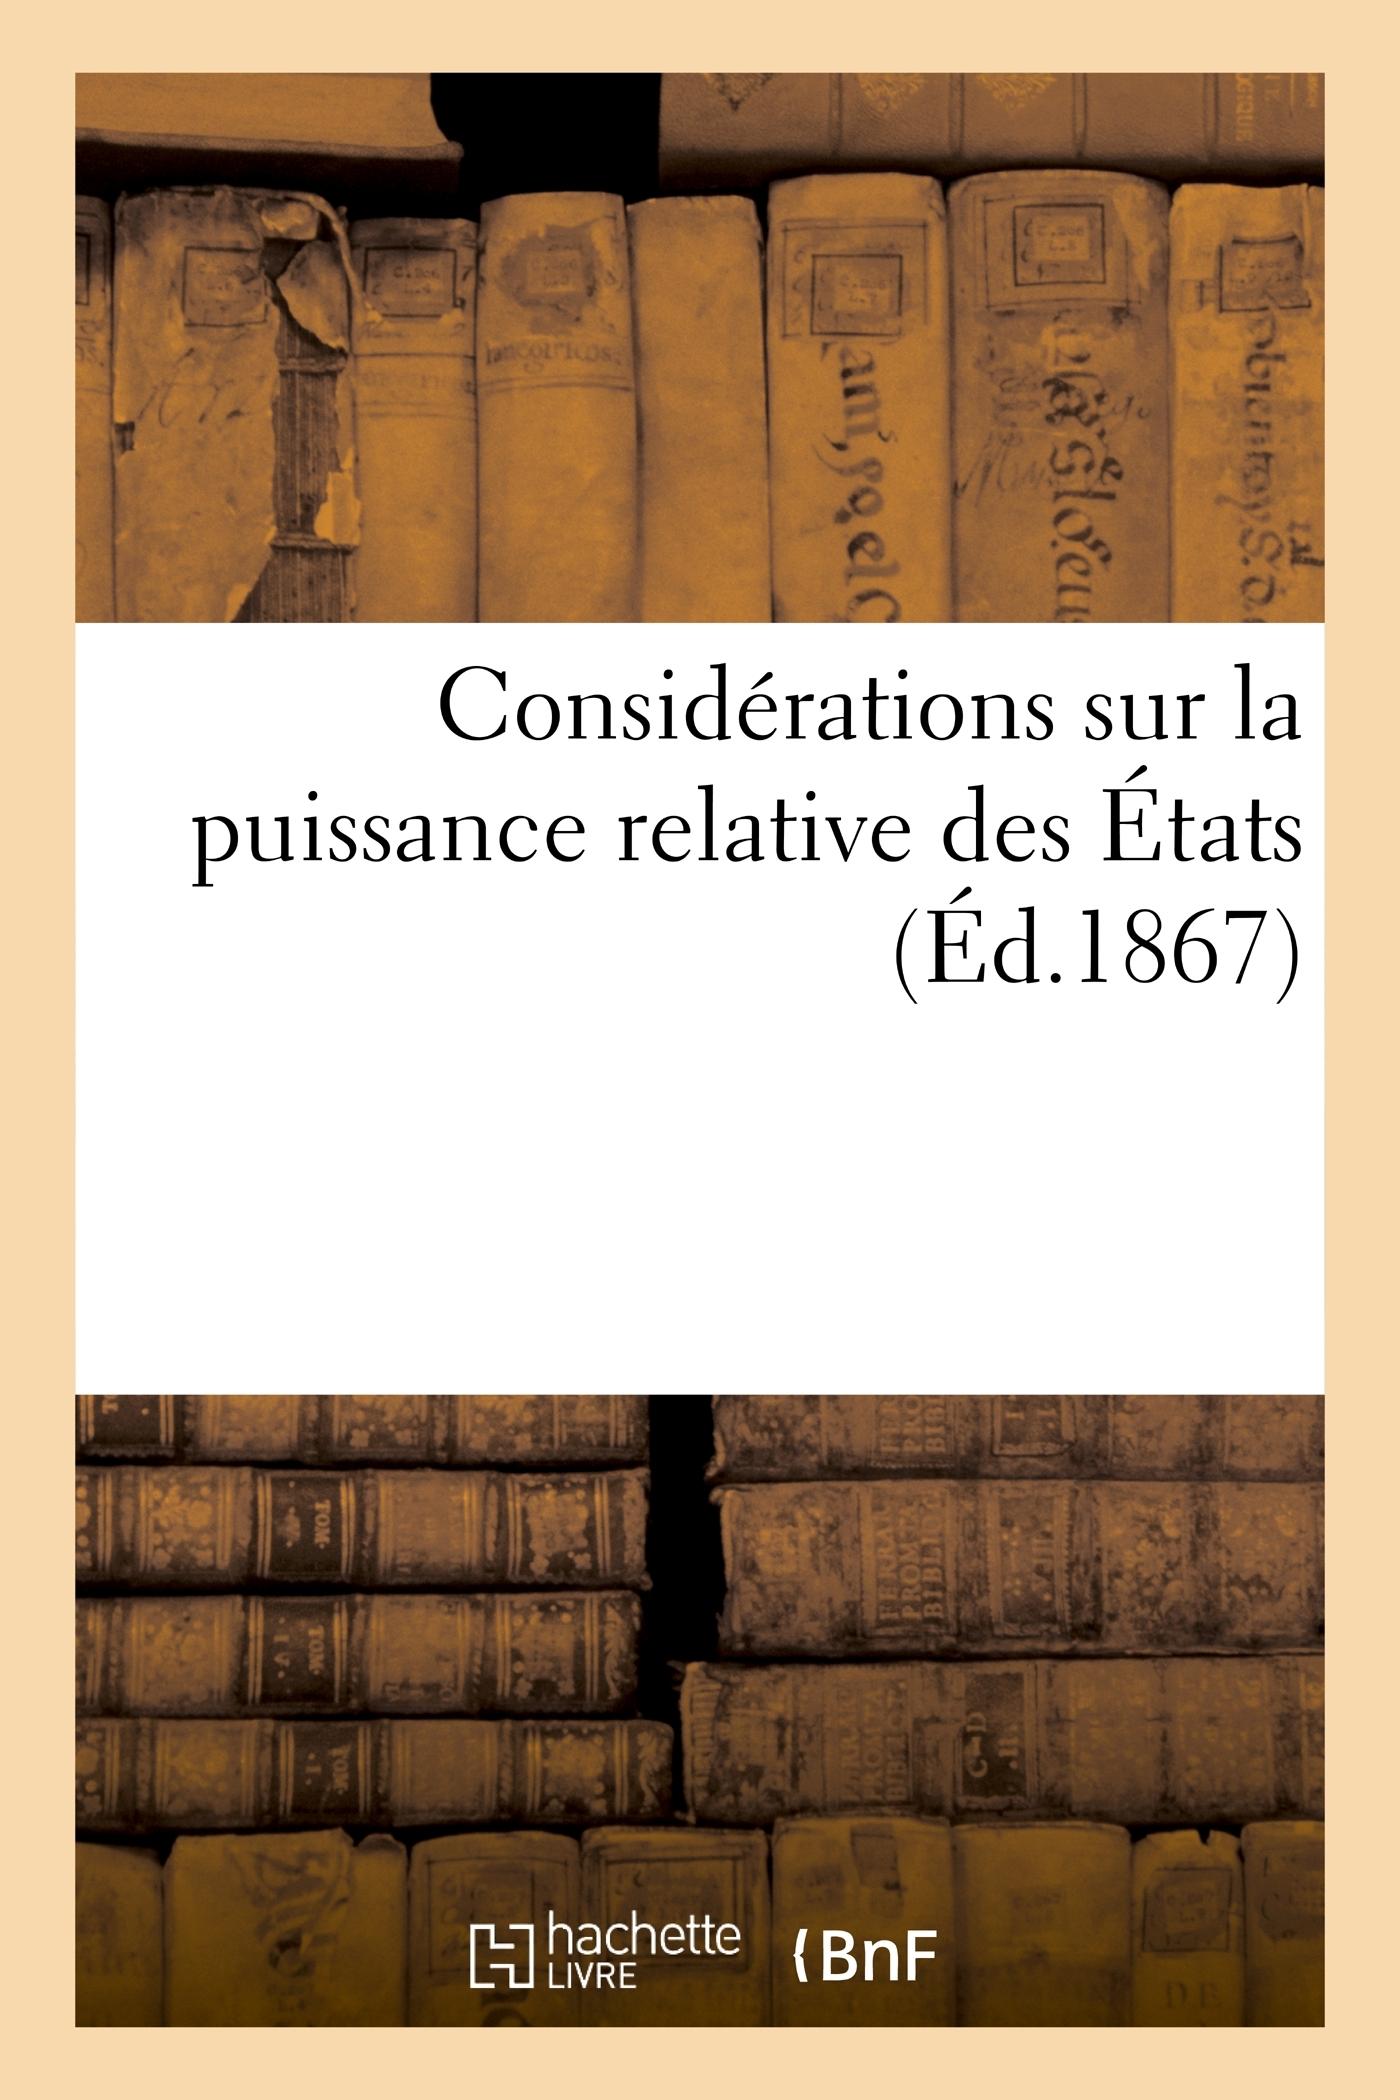 CONSIDERATIONS SUR LA PUISSANCE RELATIVE DES ETATS